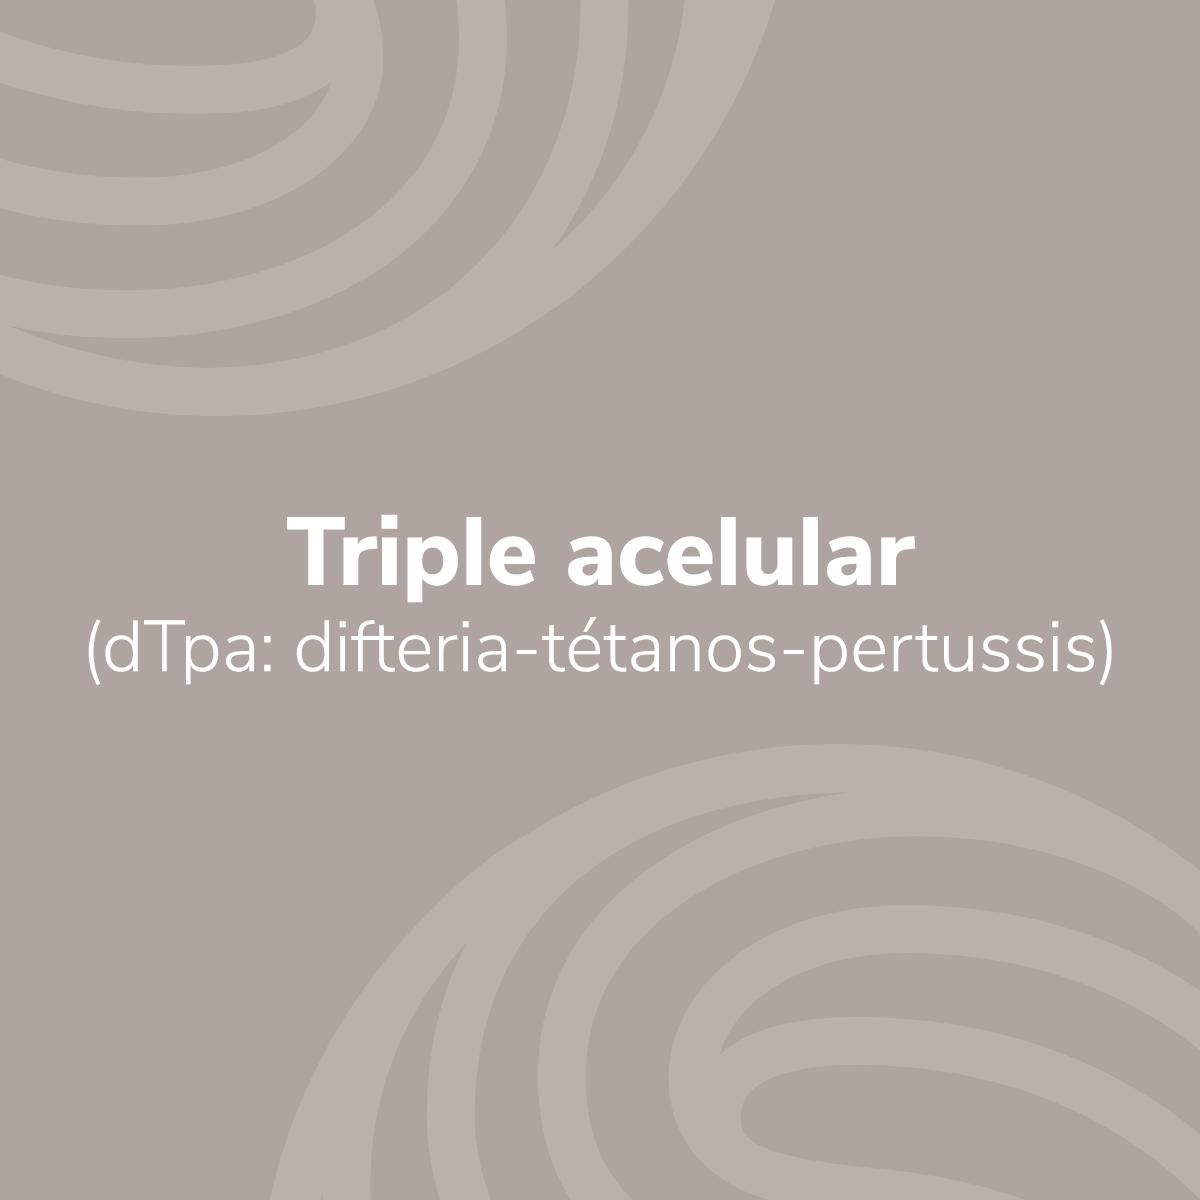 Triple acelular (dTpa: difteria-tétanos-pertussis)